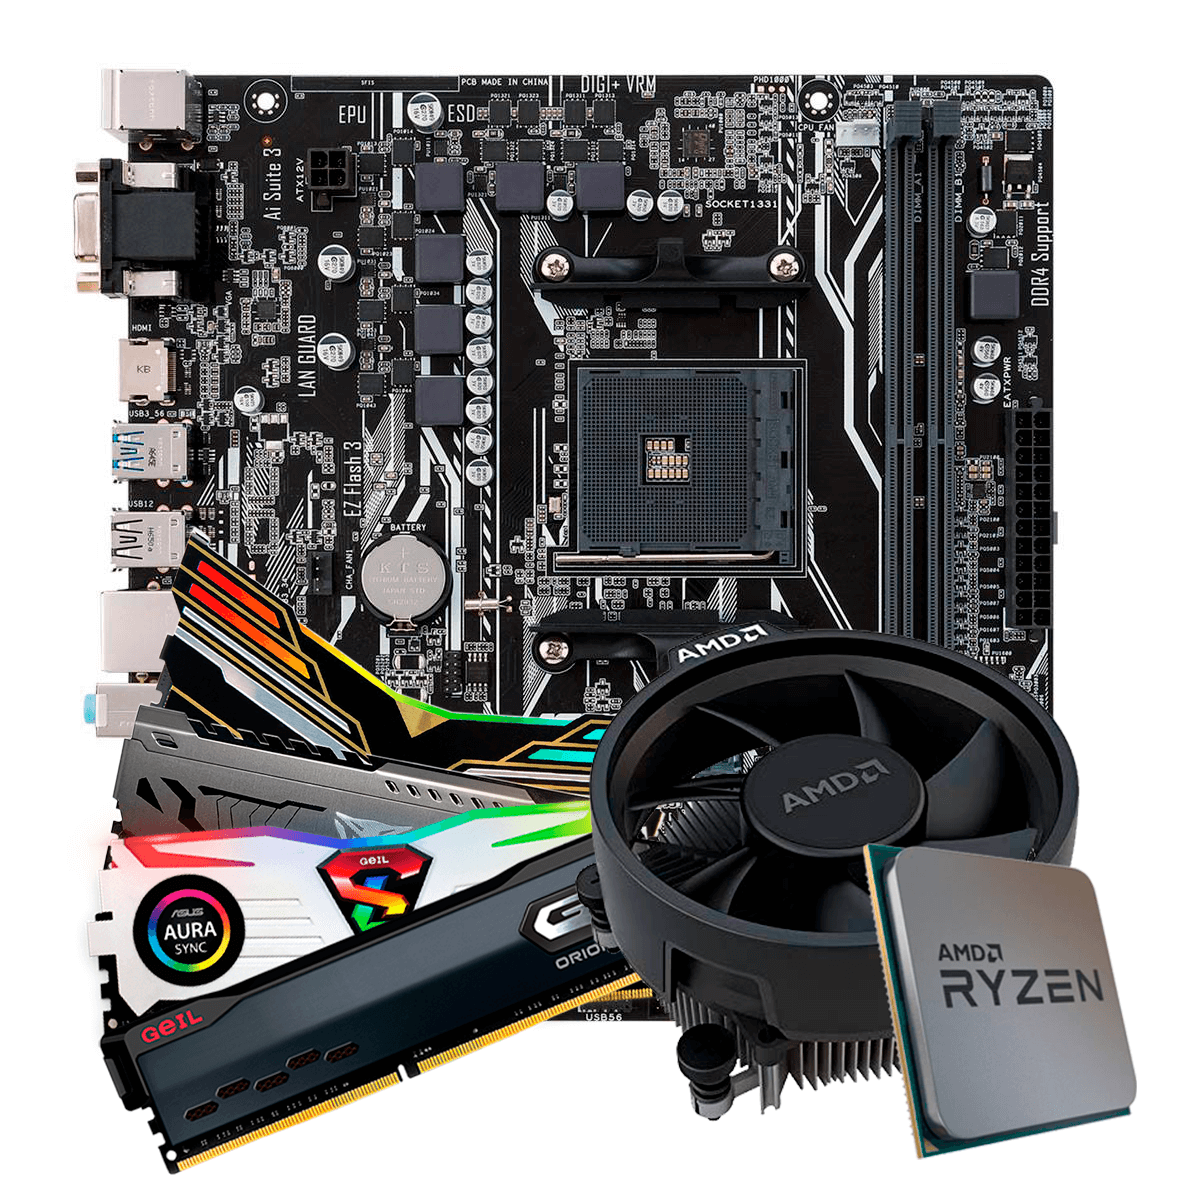 Kit Upgrade, AMD Ryzen 5 3500, Asus Prime A320M-K, Memória DDR4 (2x8GB) 16GB 3000MHz